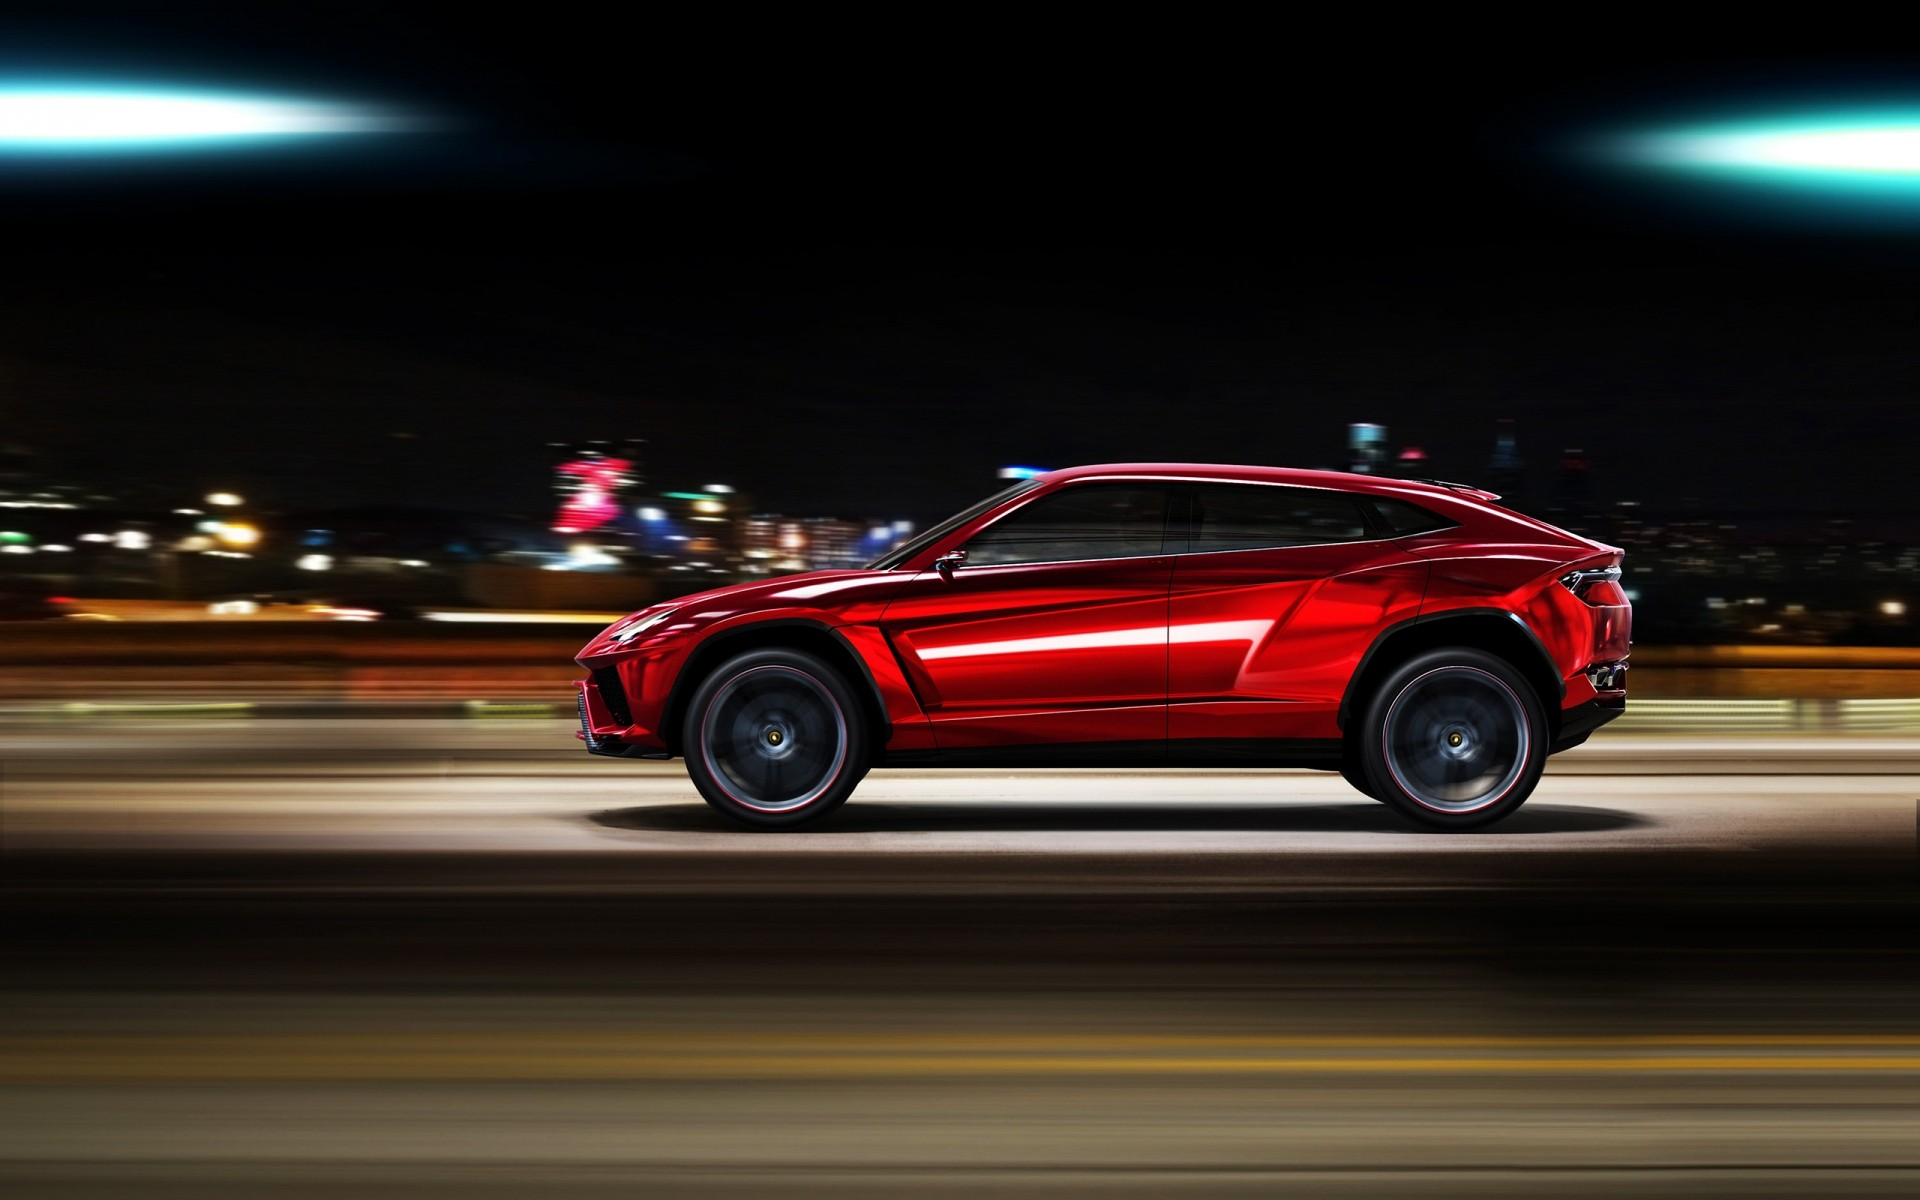 Lamborghini Urus Speed Phone Wallpapers